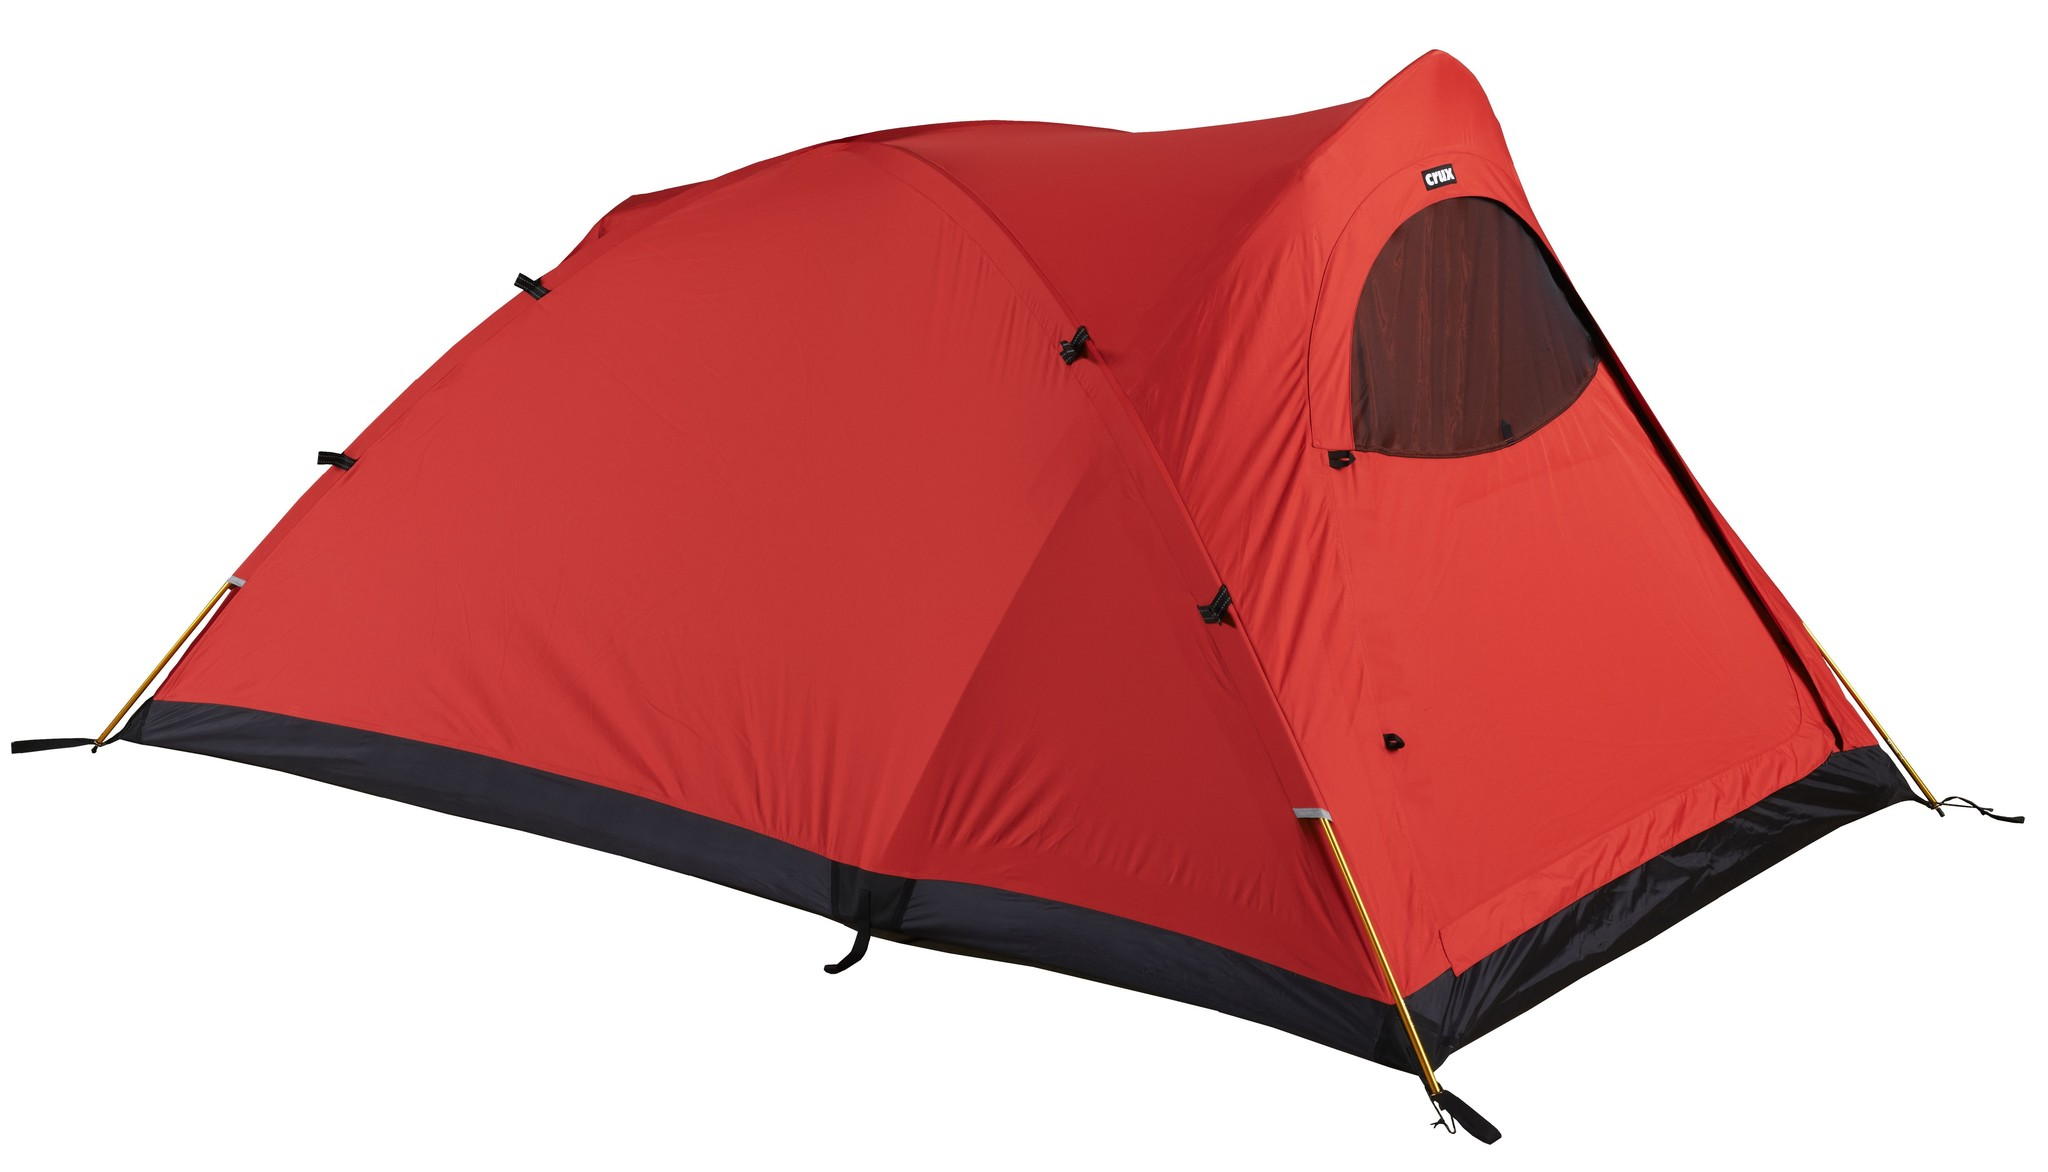 Crux X1 Raid 2 pers. Mountain Bivi Tent